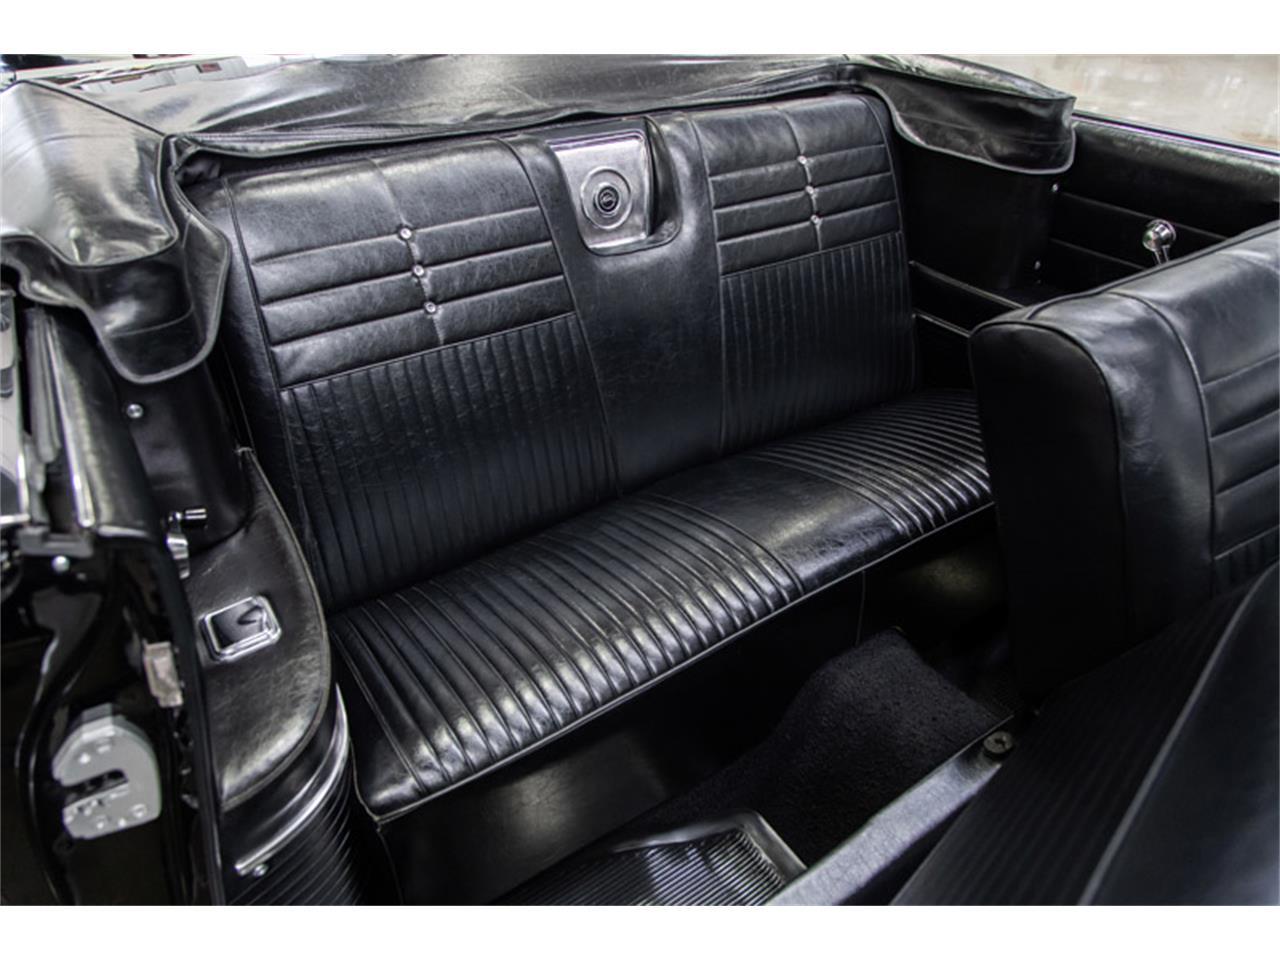 1964 Chevrolet Impala (CC-1392598) for sale in Seekonk, Massachusetts